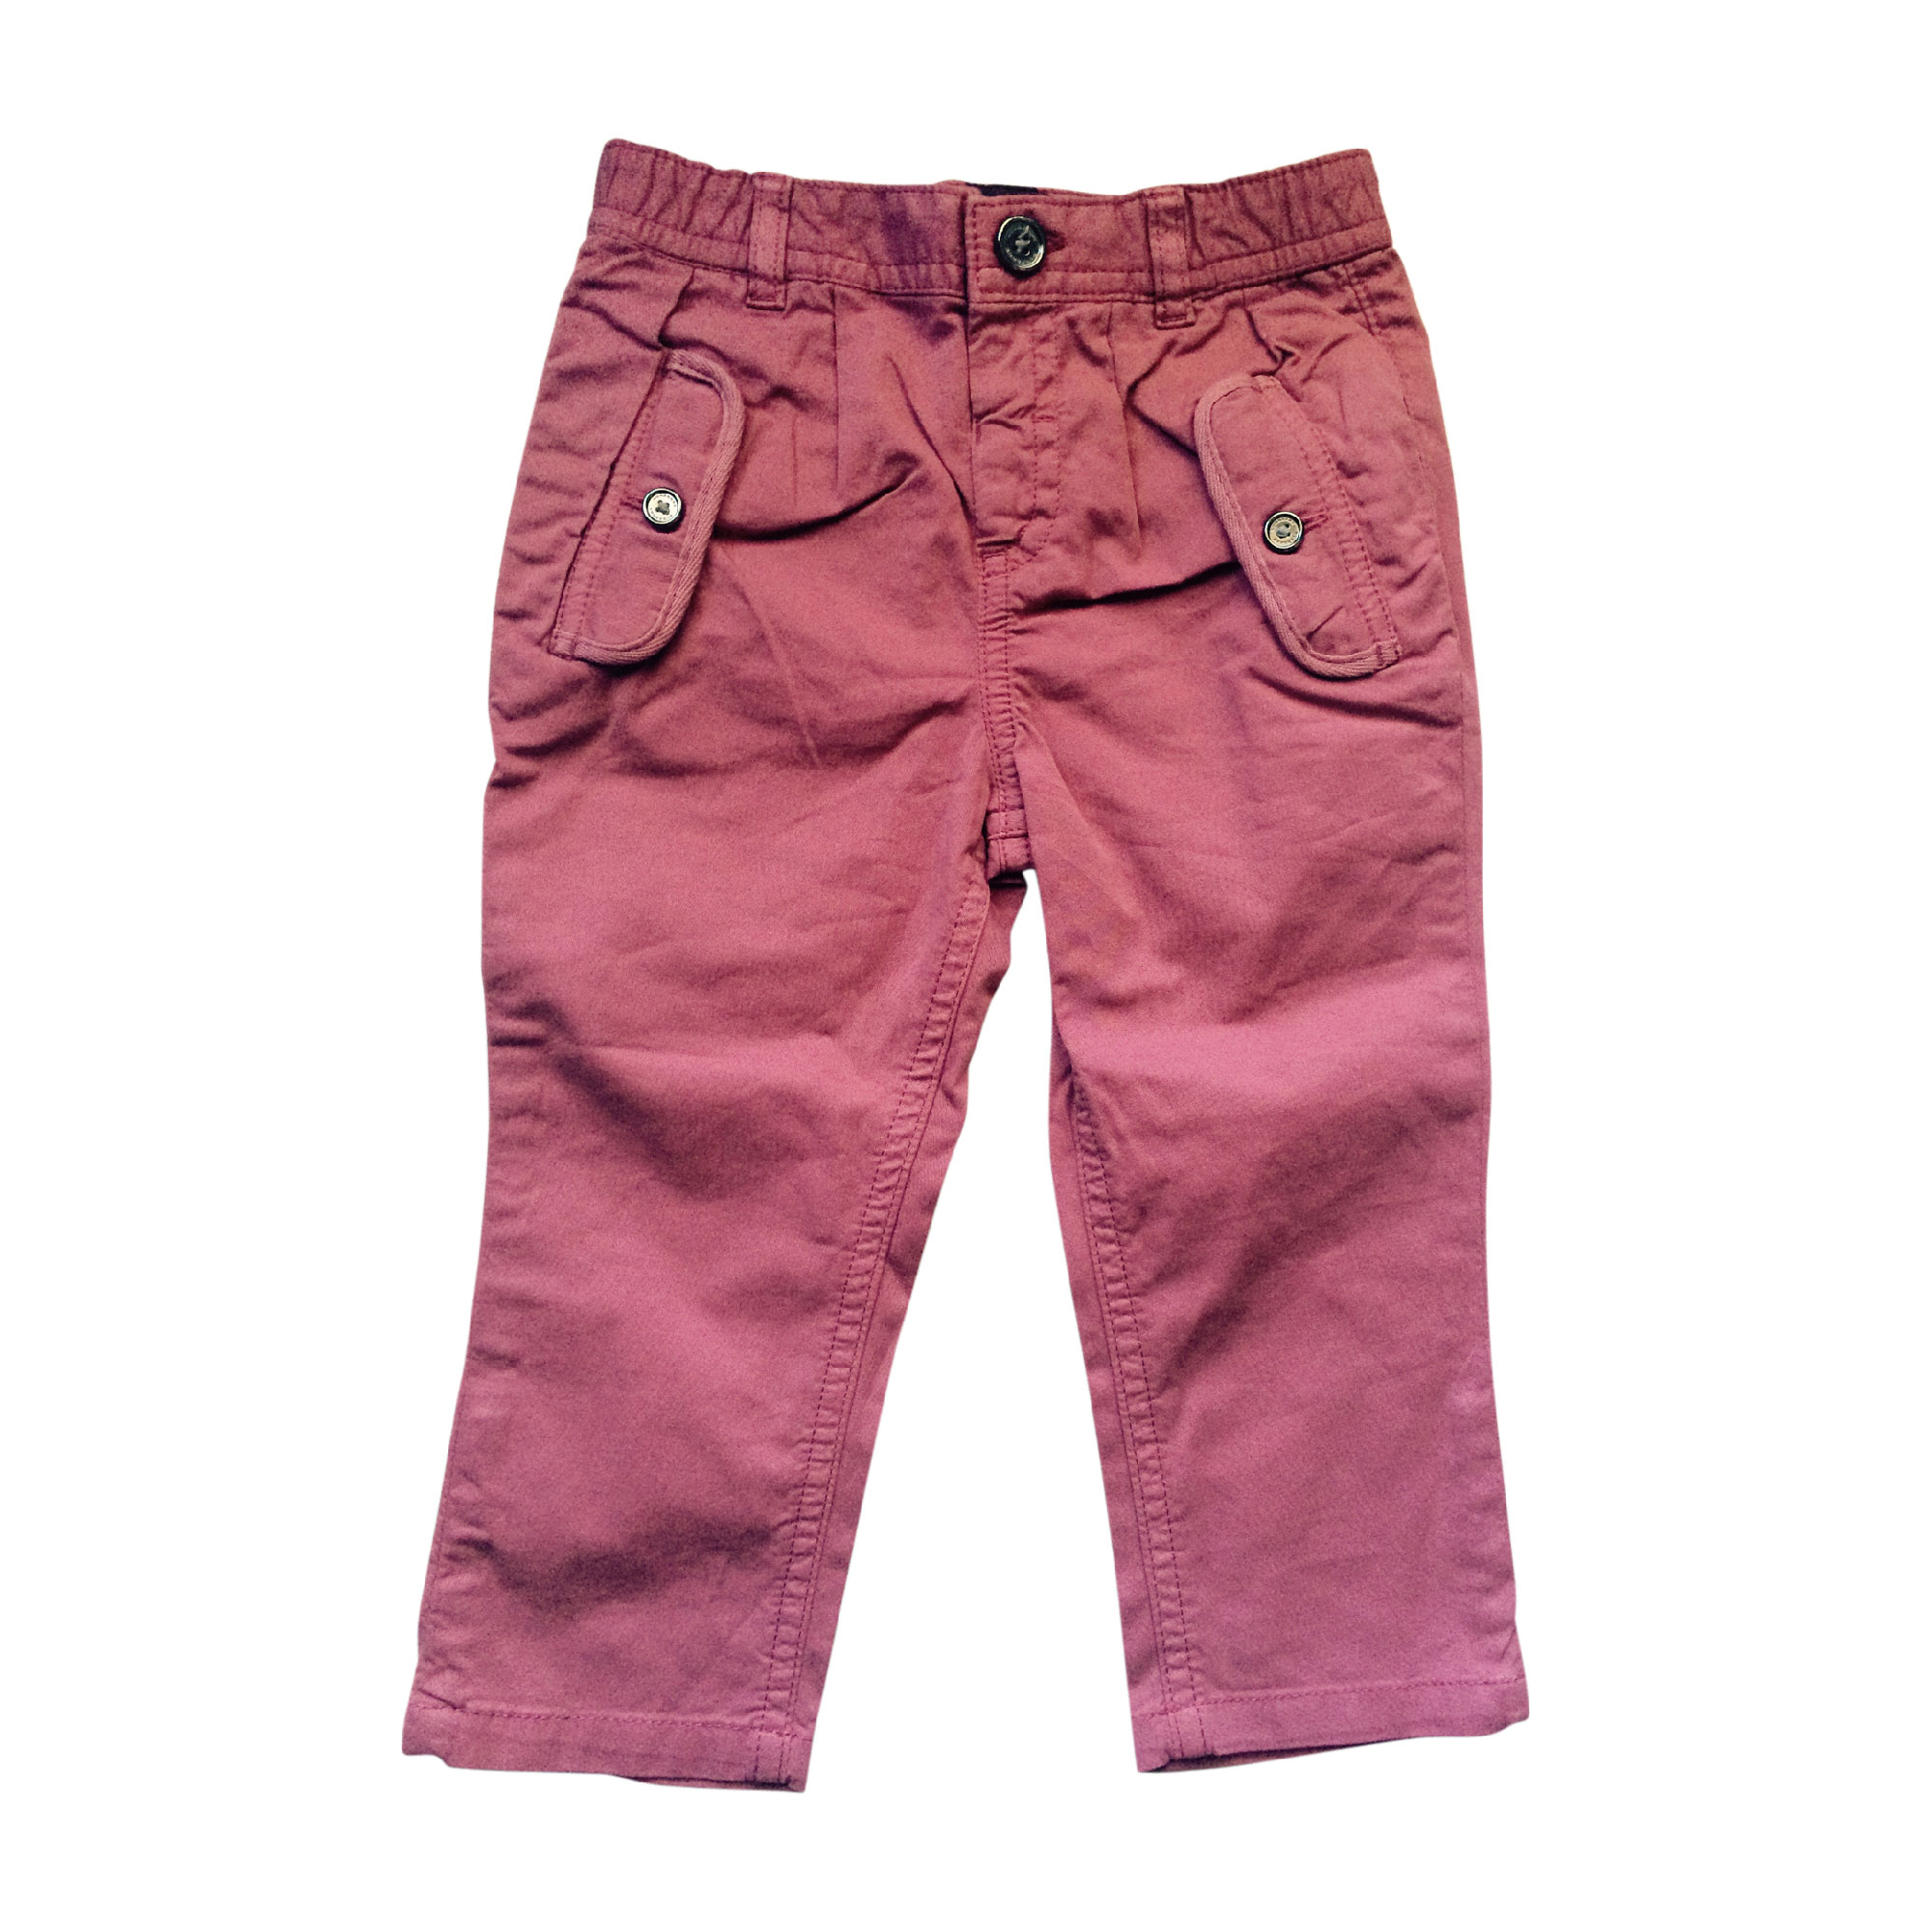 Pantalon BURBERRY Rose, fuschia, vieux rose